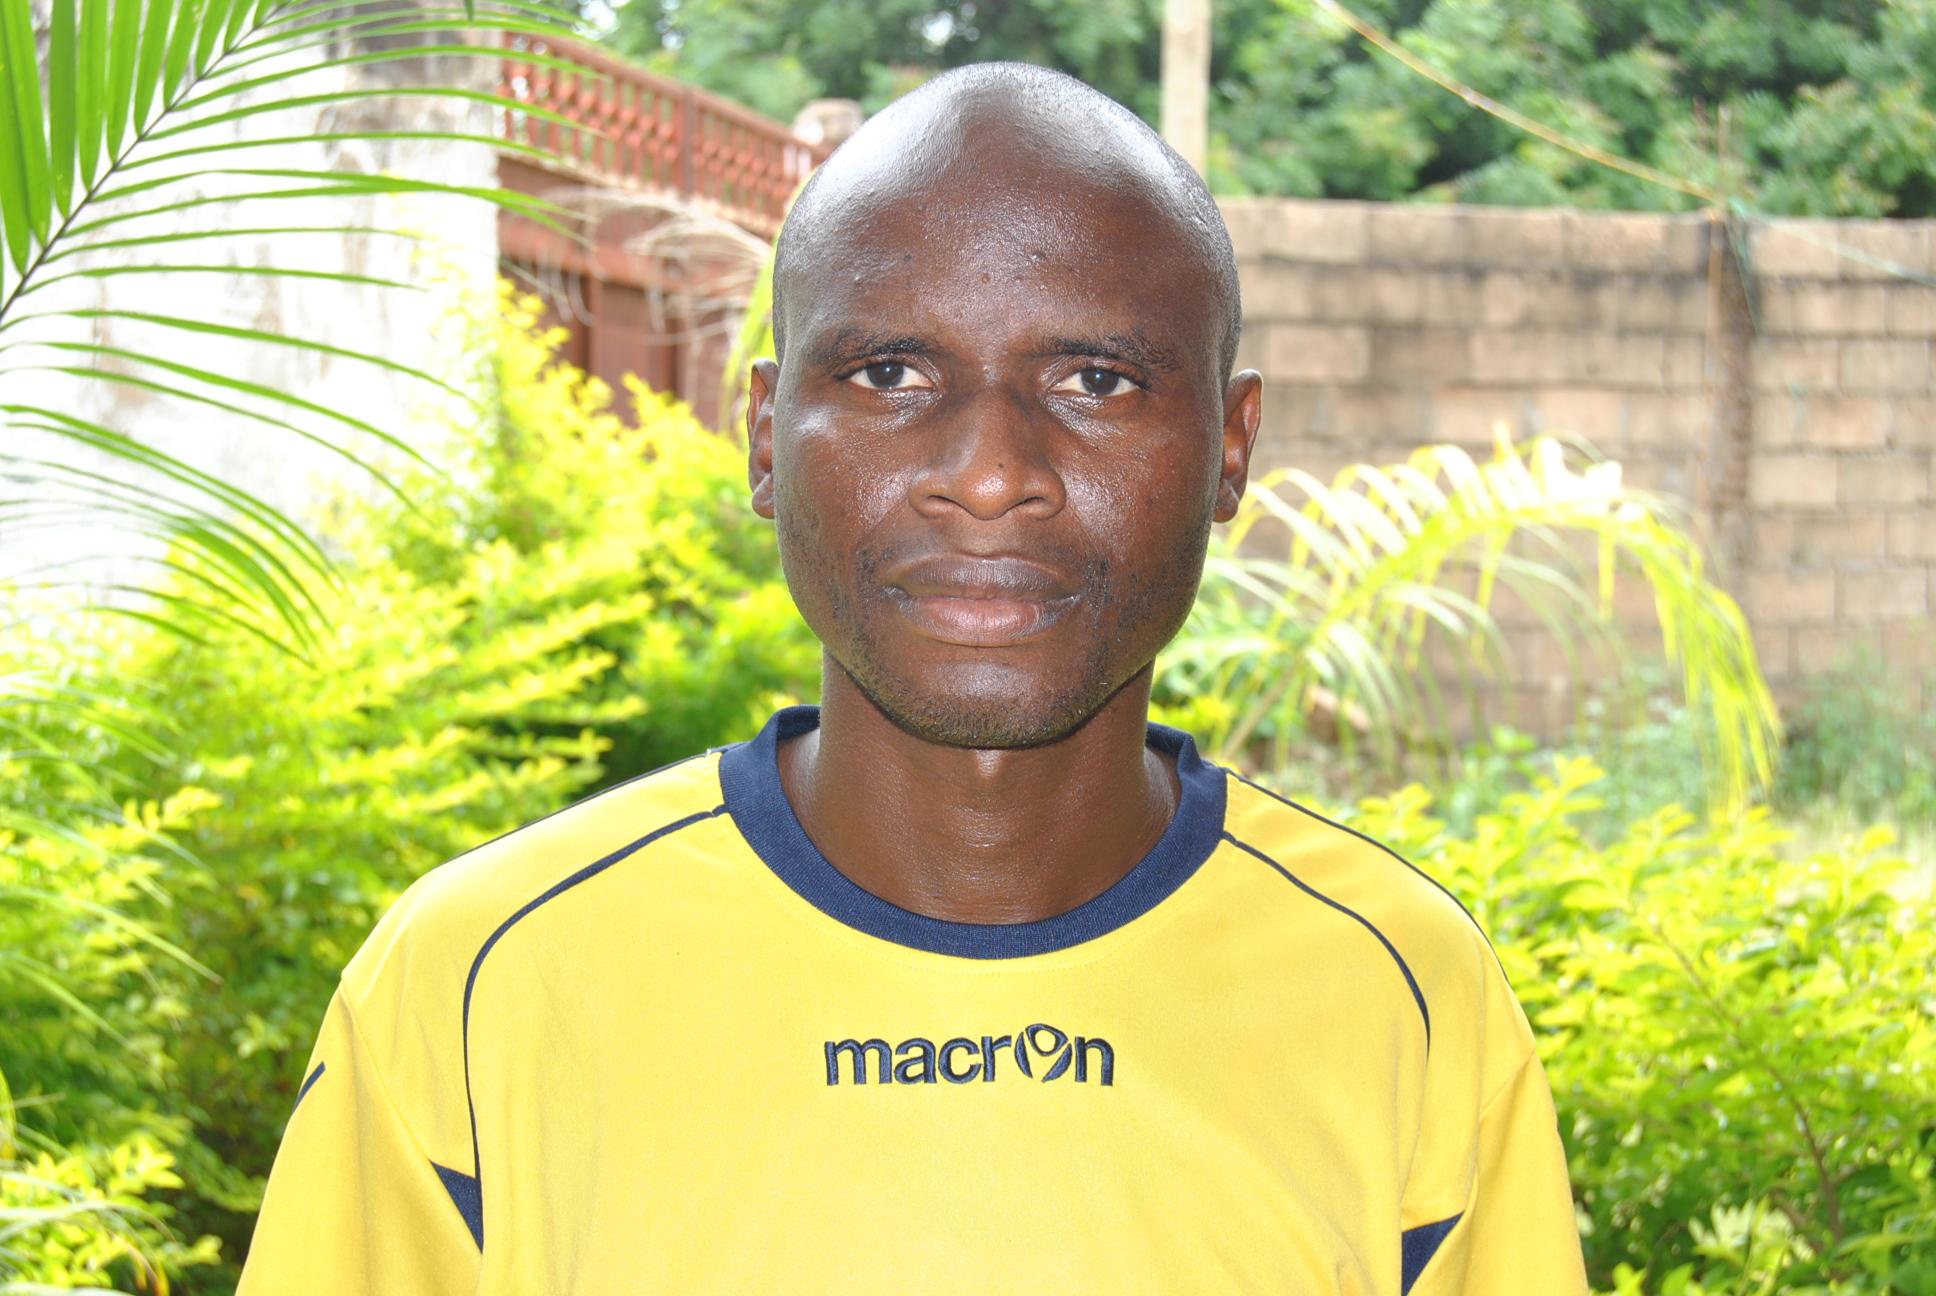 Técnico de futebol, Benelívio Cabral Nancassa Insali